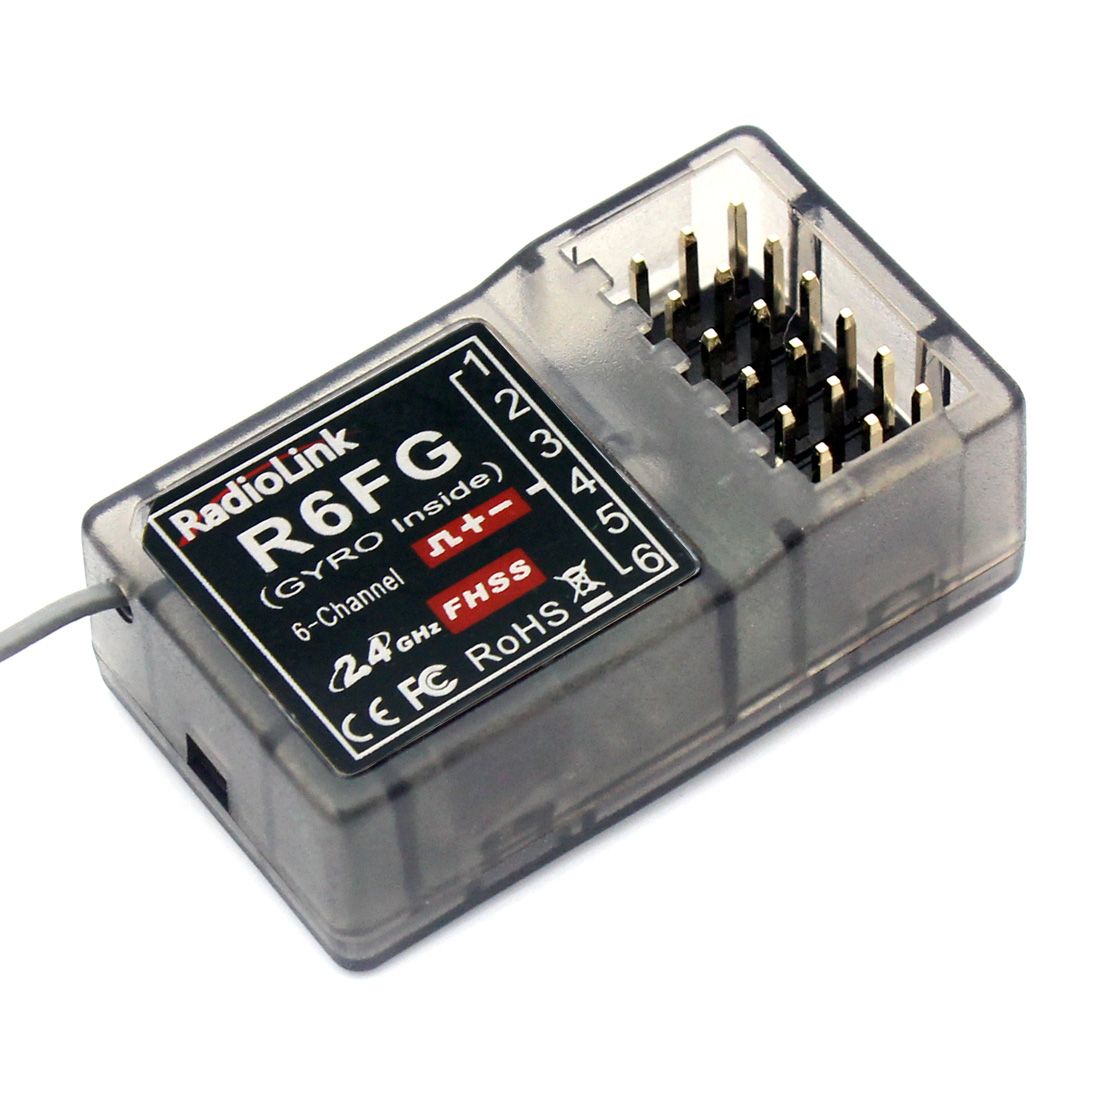 Radiolink FHSS R6FG 2,4G 6 4-kanal-funkfernsteuerung System RC6GS RX Empfänger F21425